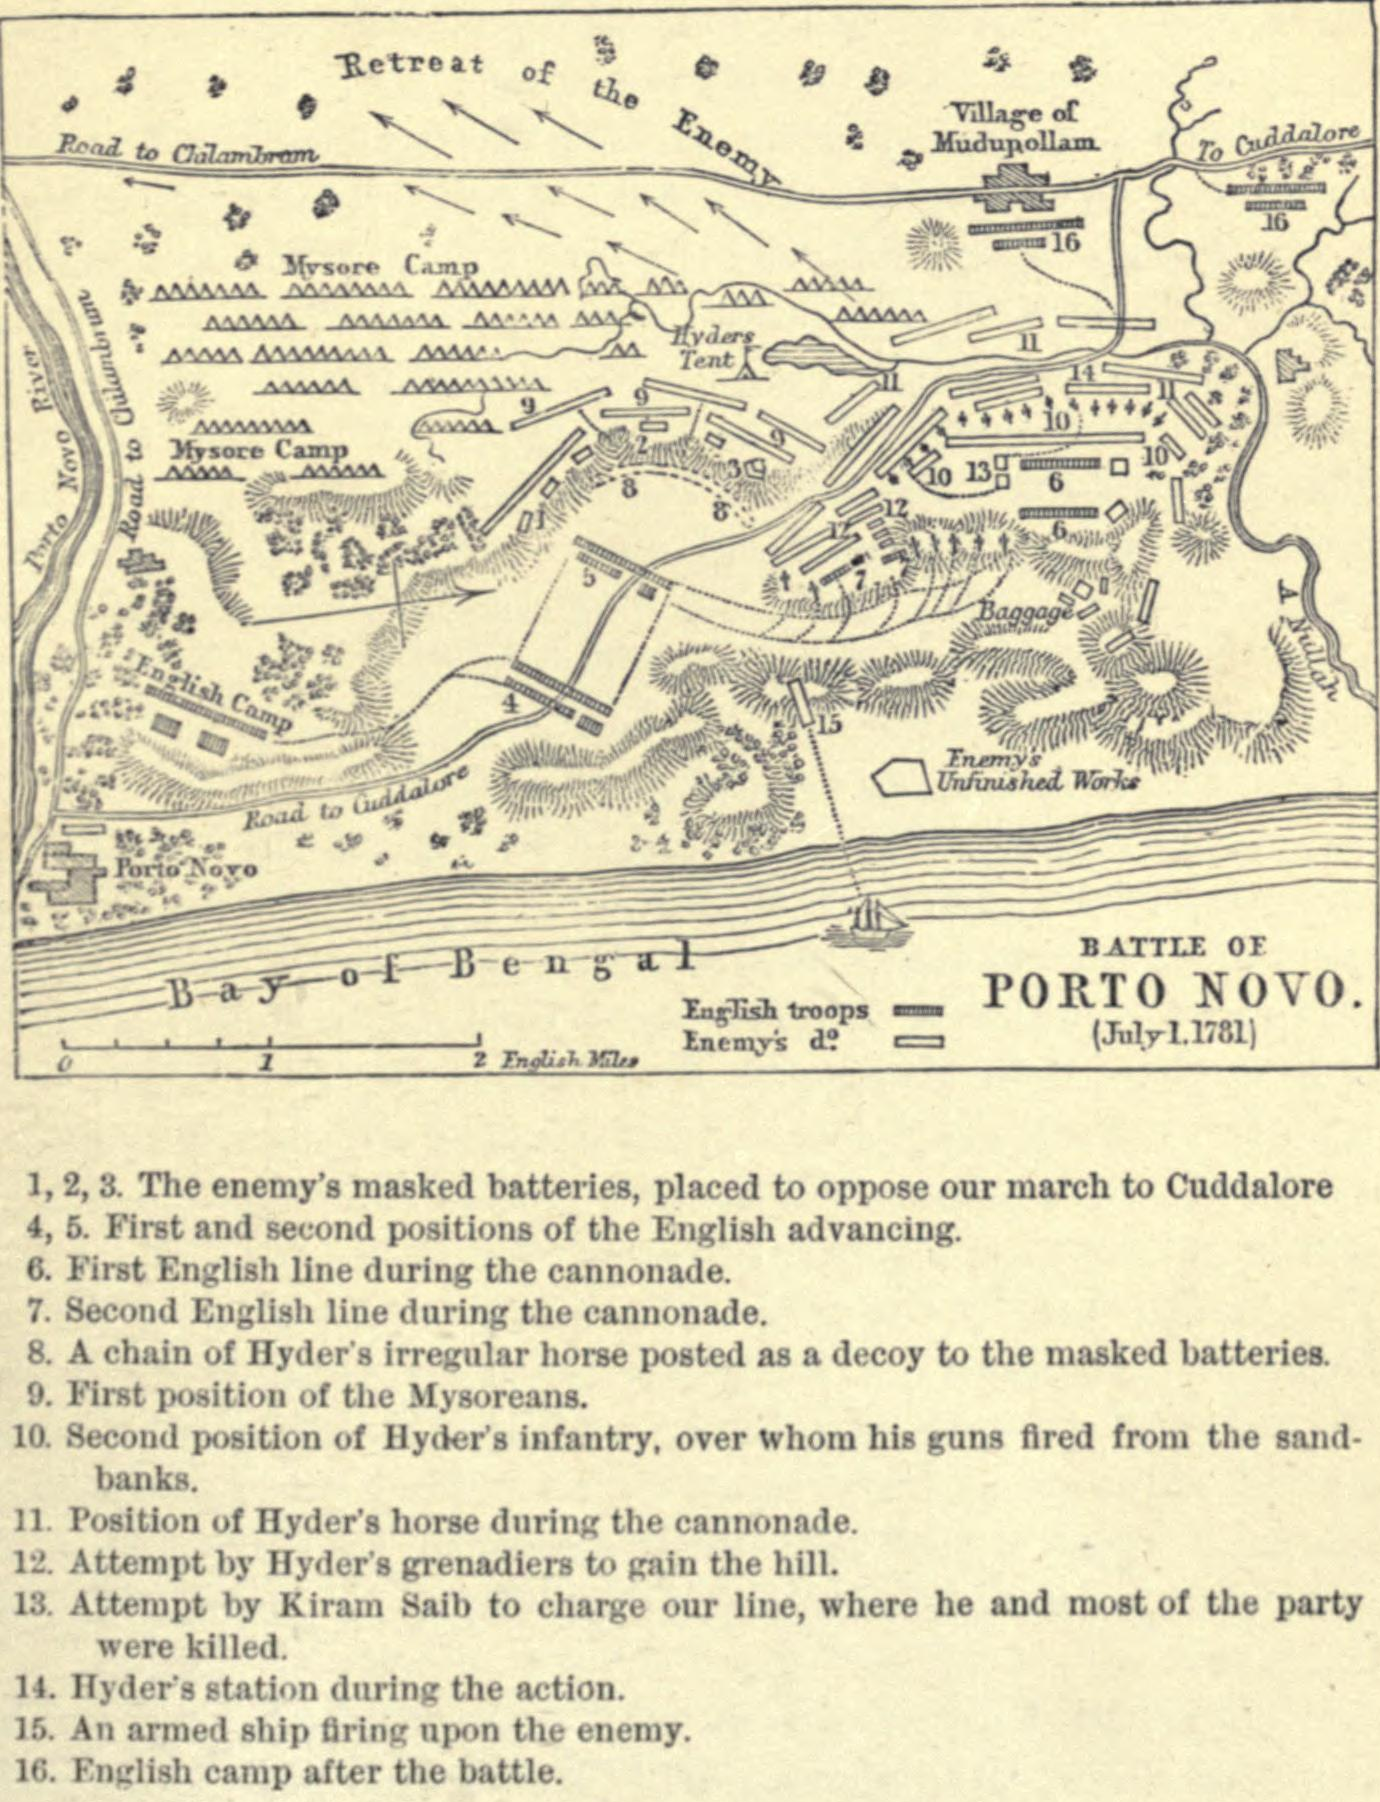 Battle of Porto Novo.jpg